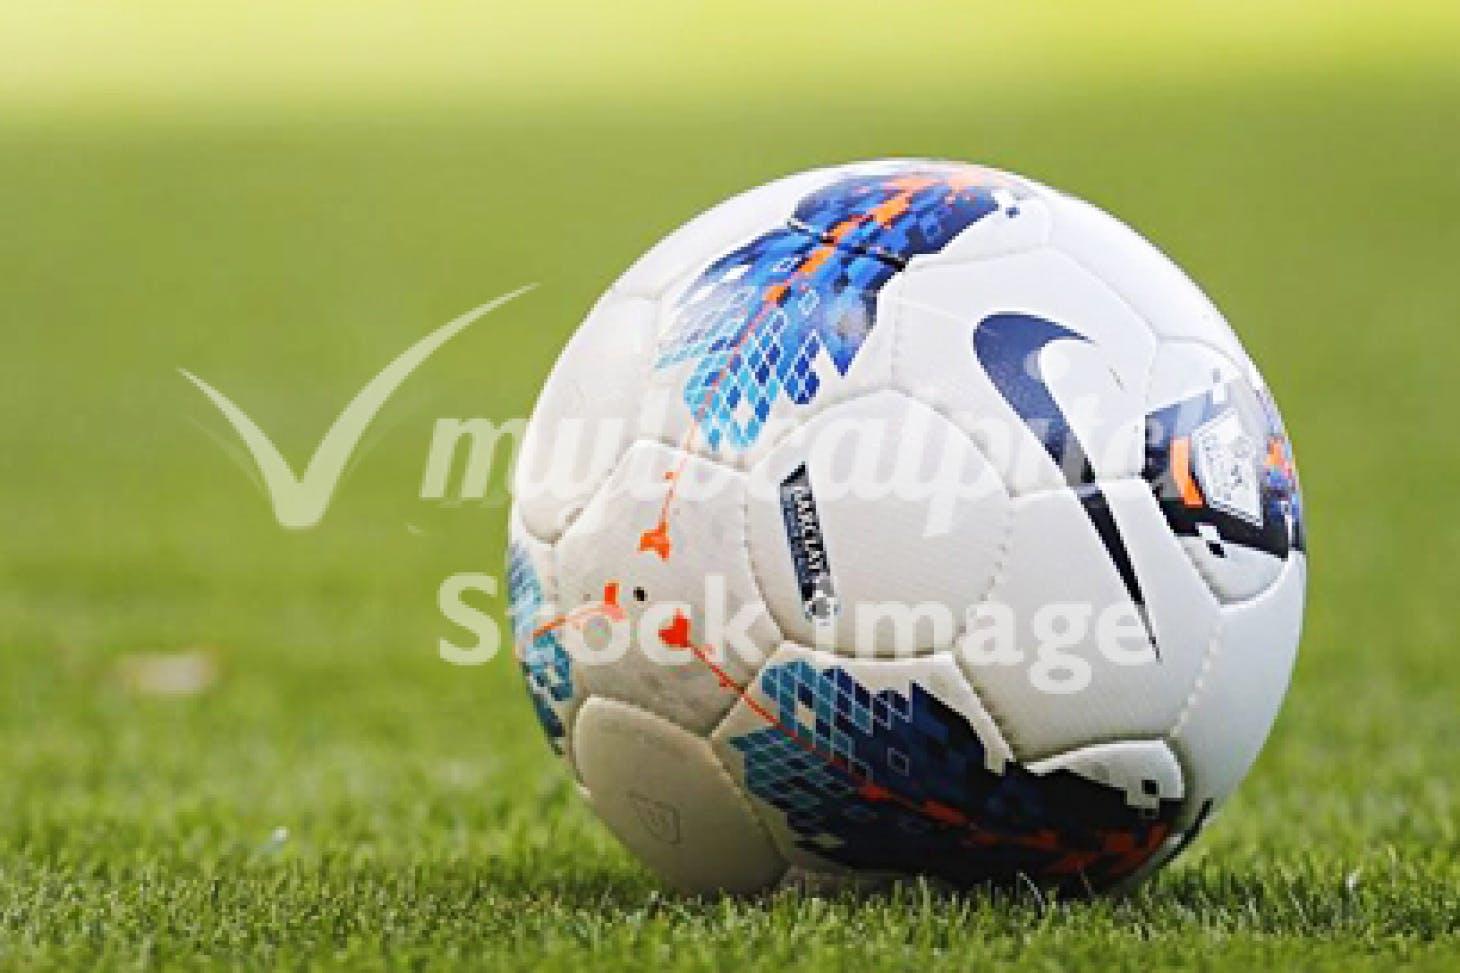 Desborough Park 5 a side | Concrete football pitch